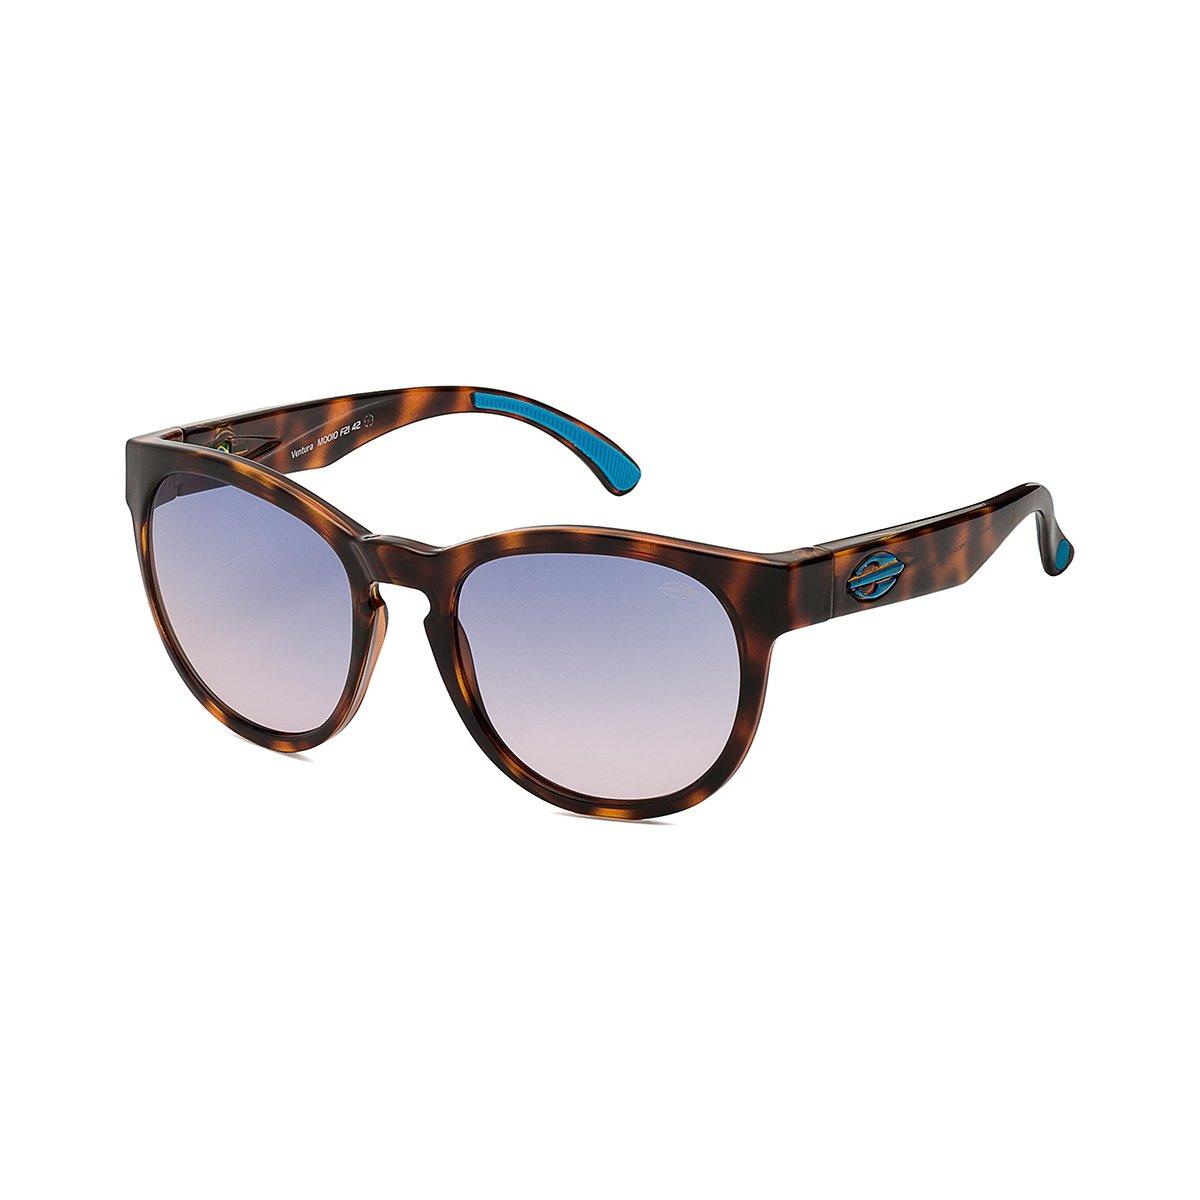 0ee2f19af74f5 Oculos Sol Mormaii Ventura - Compre Agora   Zattini